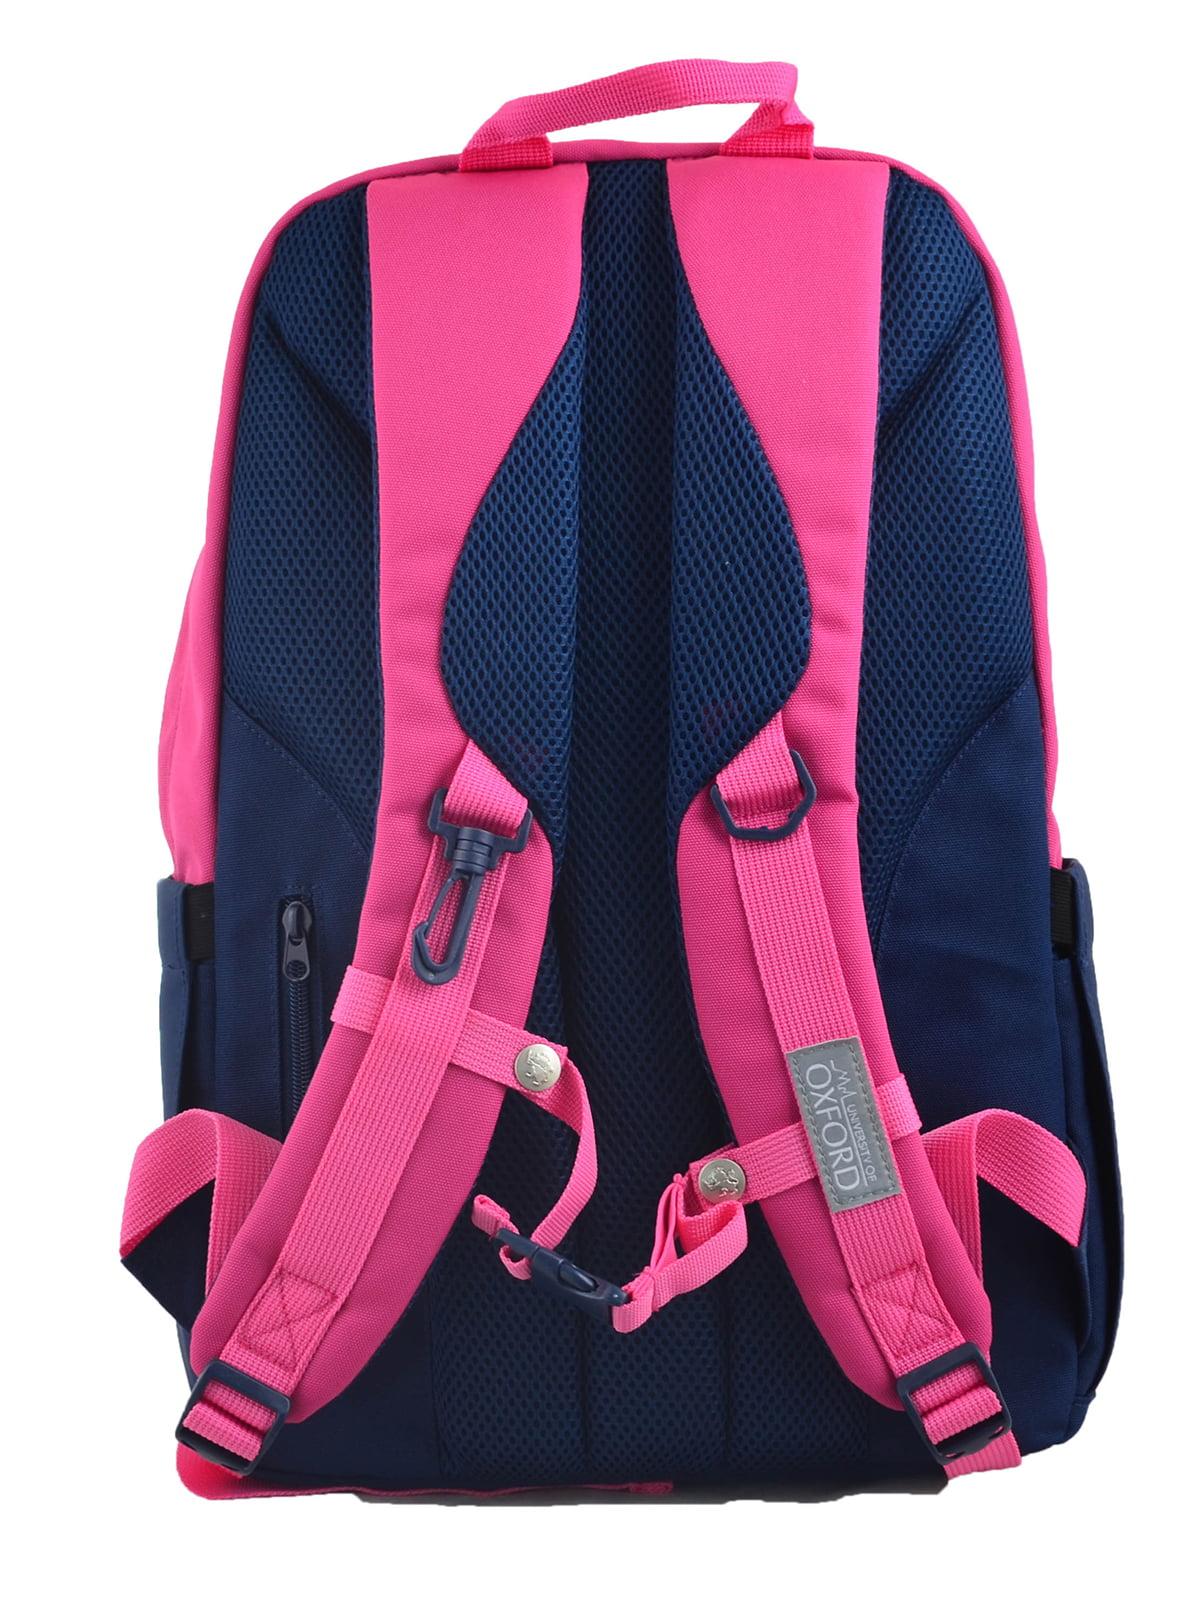 Рюкзак синьо-рожевий | 4214891 | фото 4